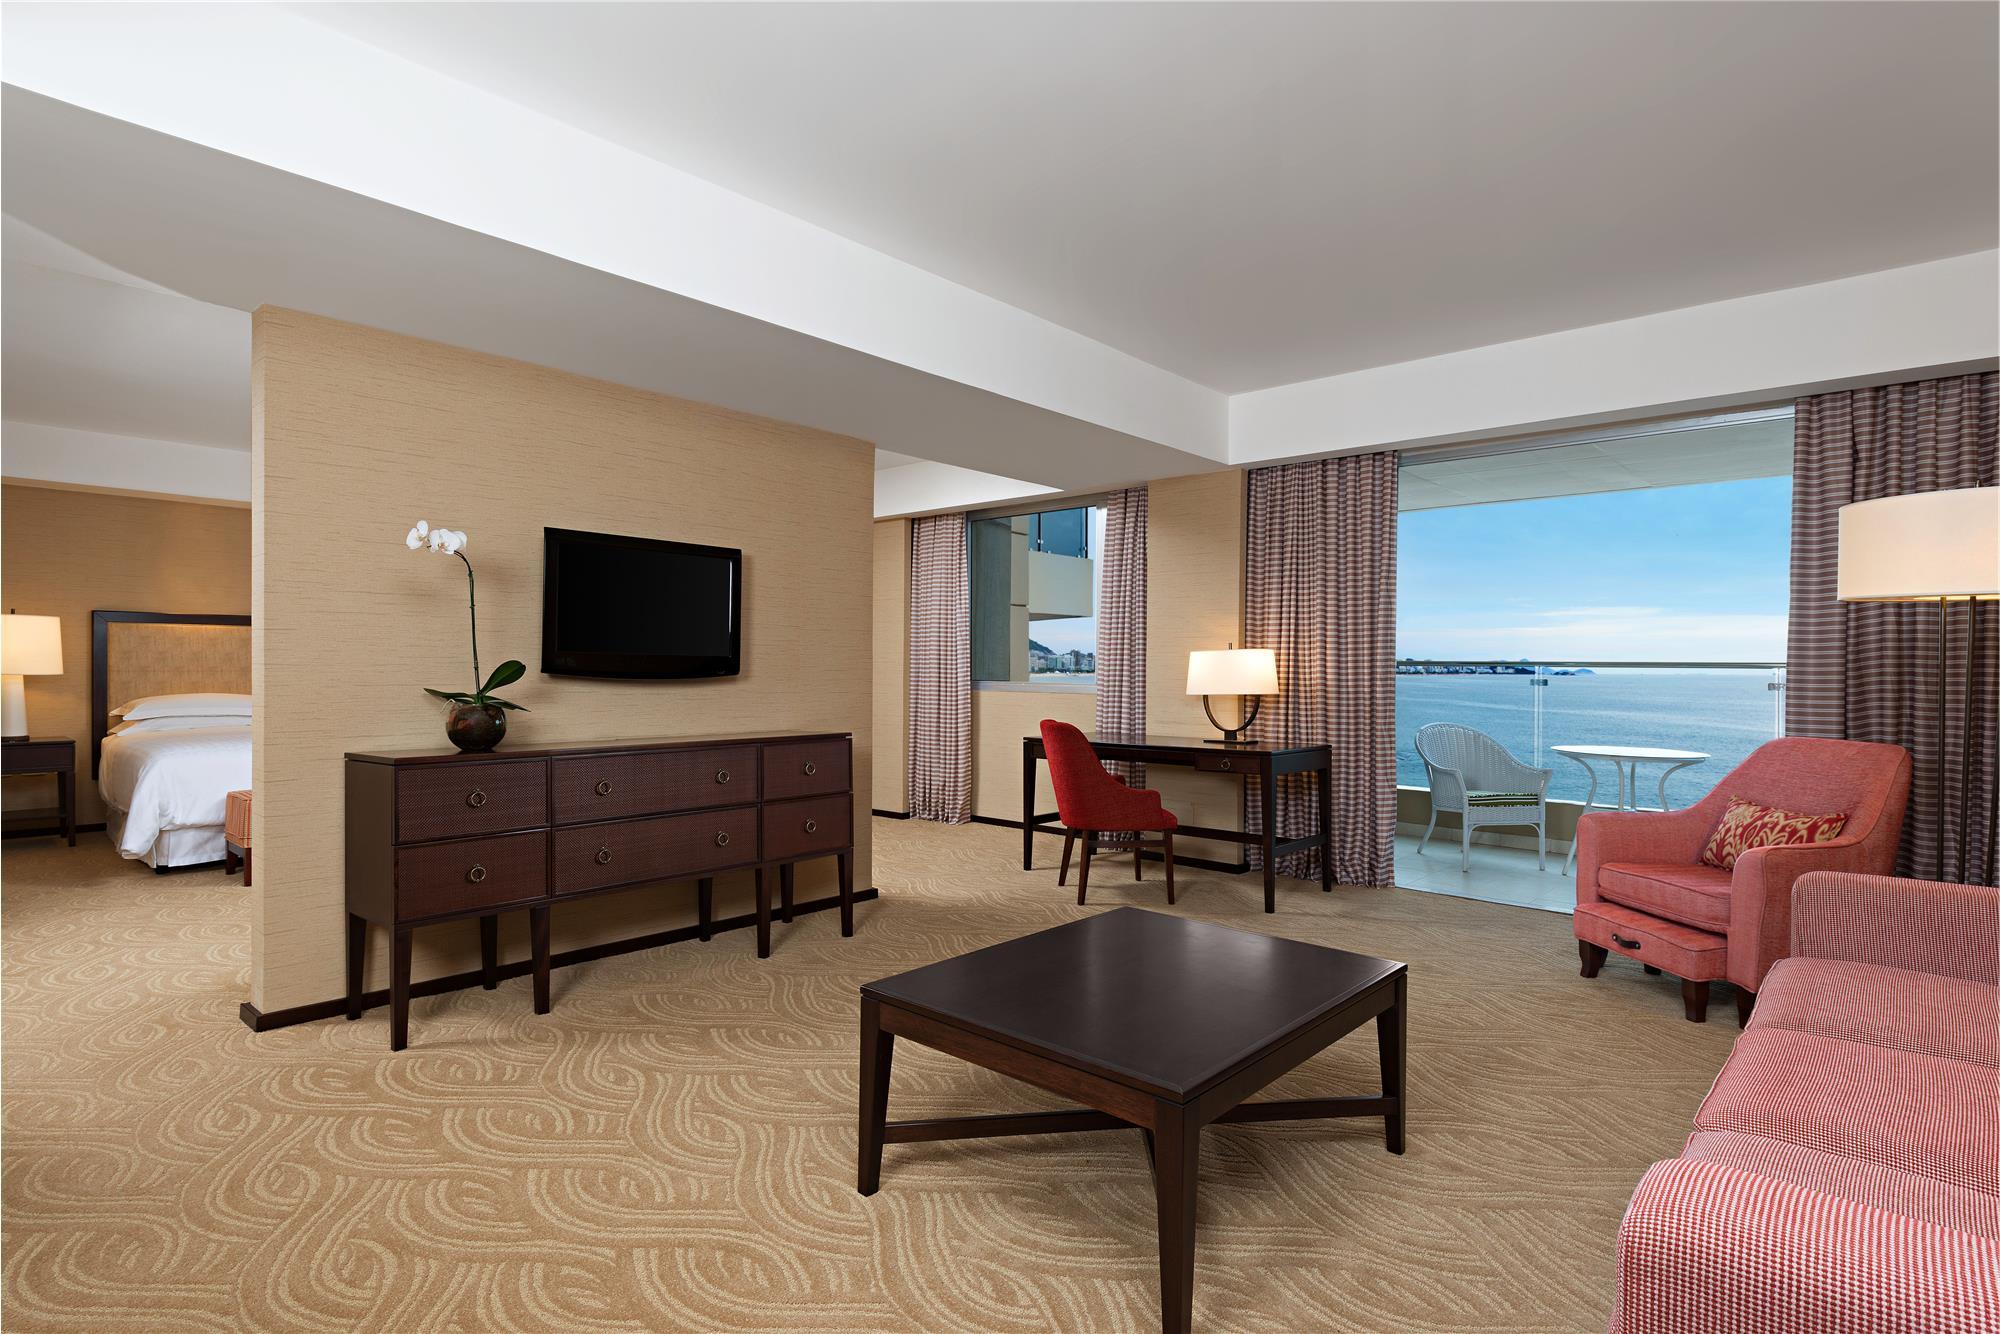 Sheraton Grand Rio Hotel amp Resort reserve um Resort na